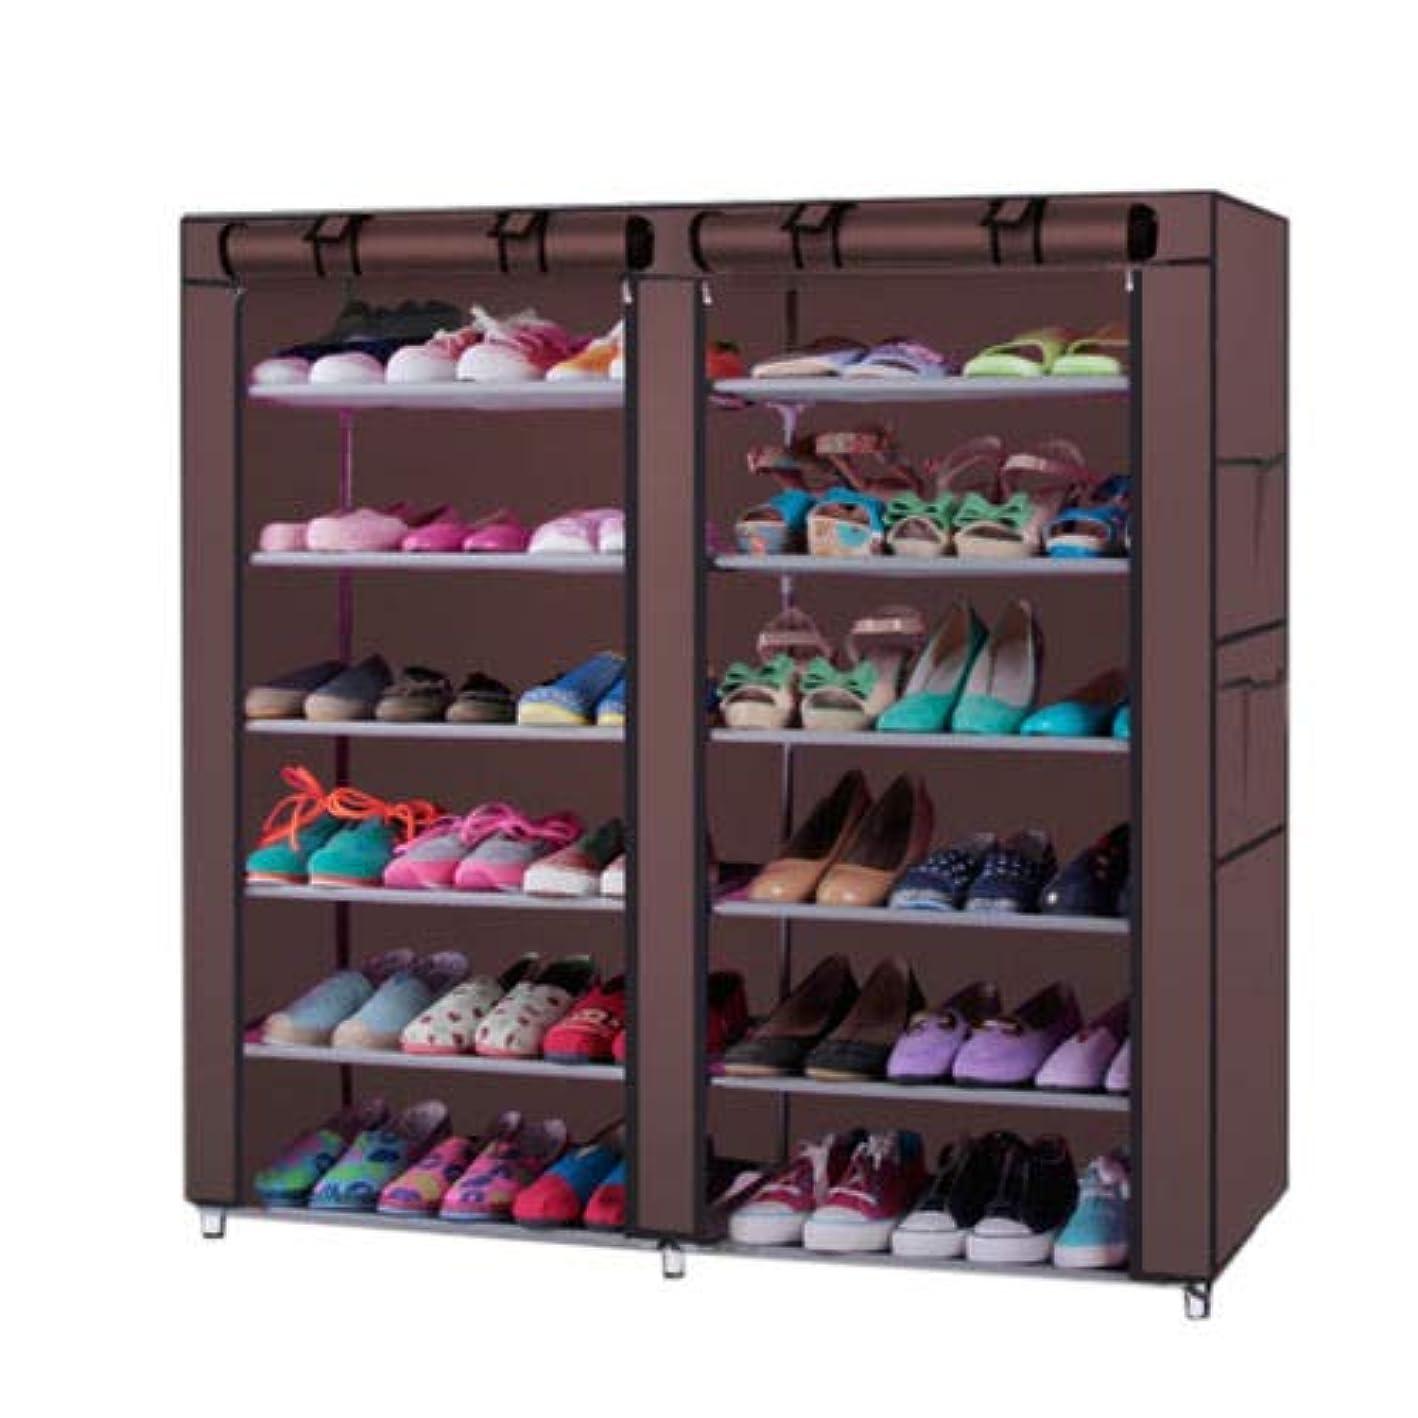 TG888 Closet Organizer Shoe Rack for 36 Pair Wall Bench Storage Box Stand Shelf Coffee